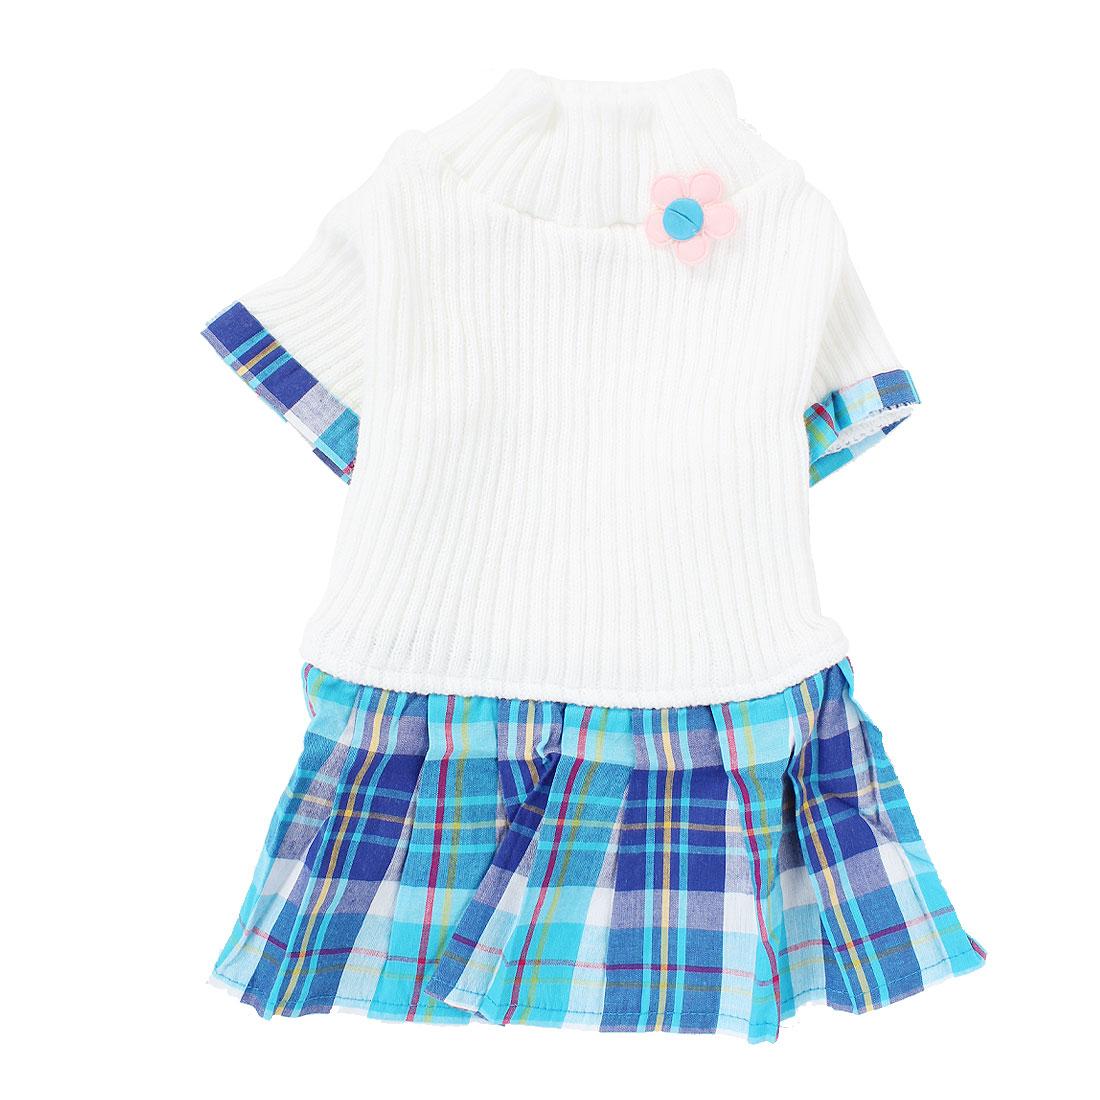 Pet Dog Warm Knitwear Sweater Plaid Pattern Dress Skirt Apparel White S